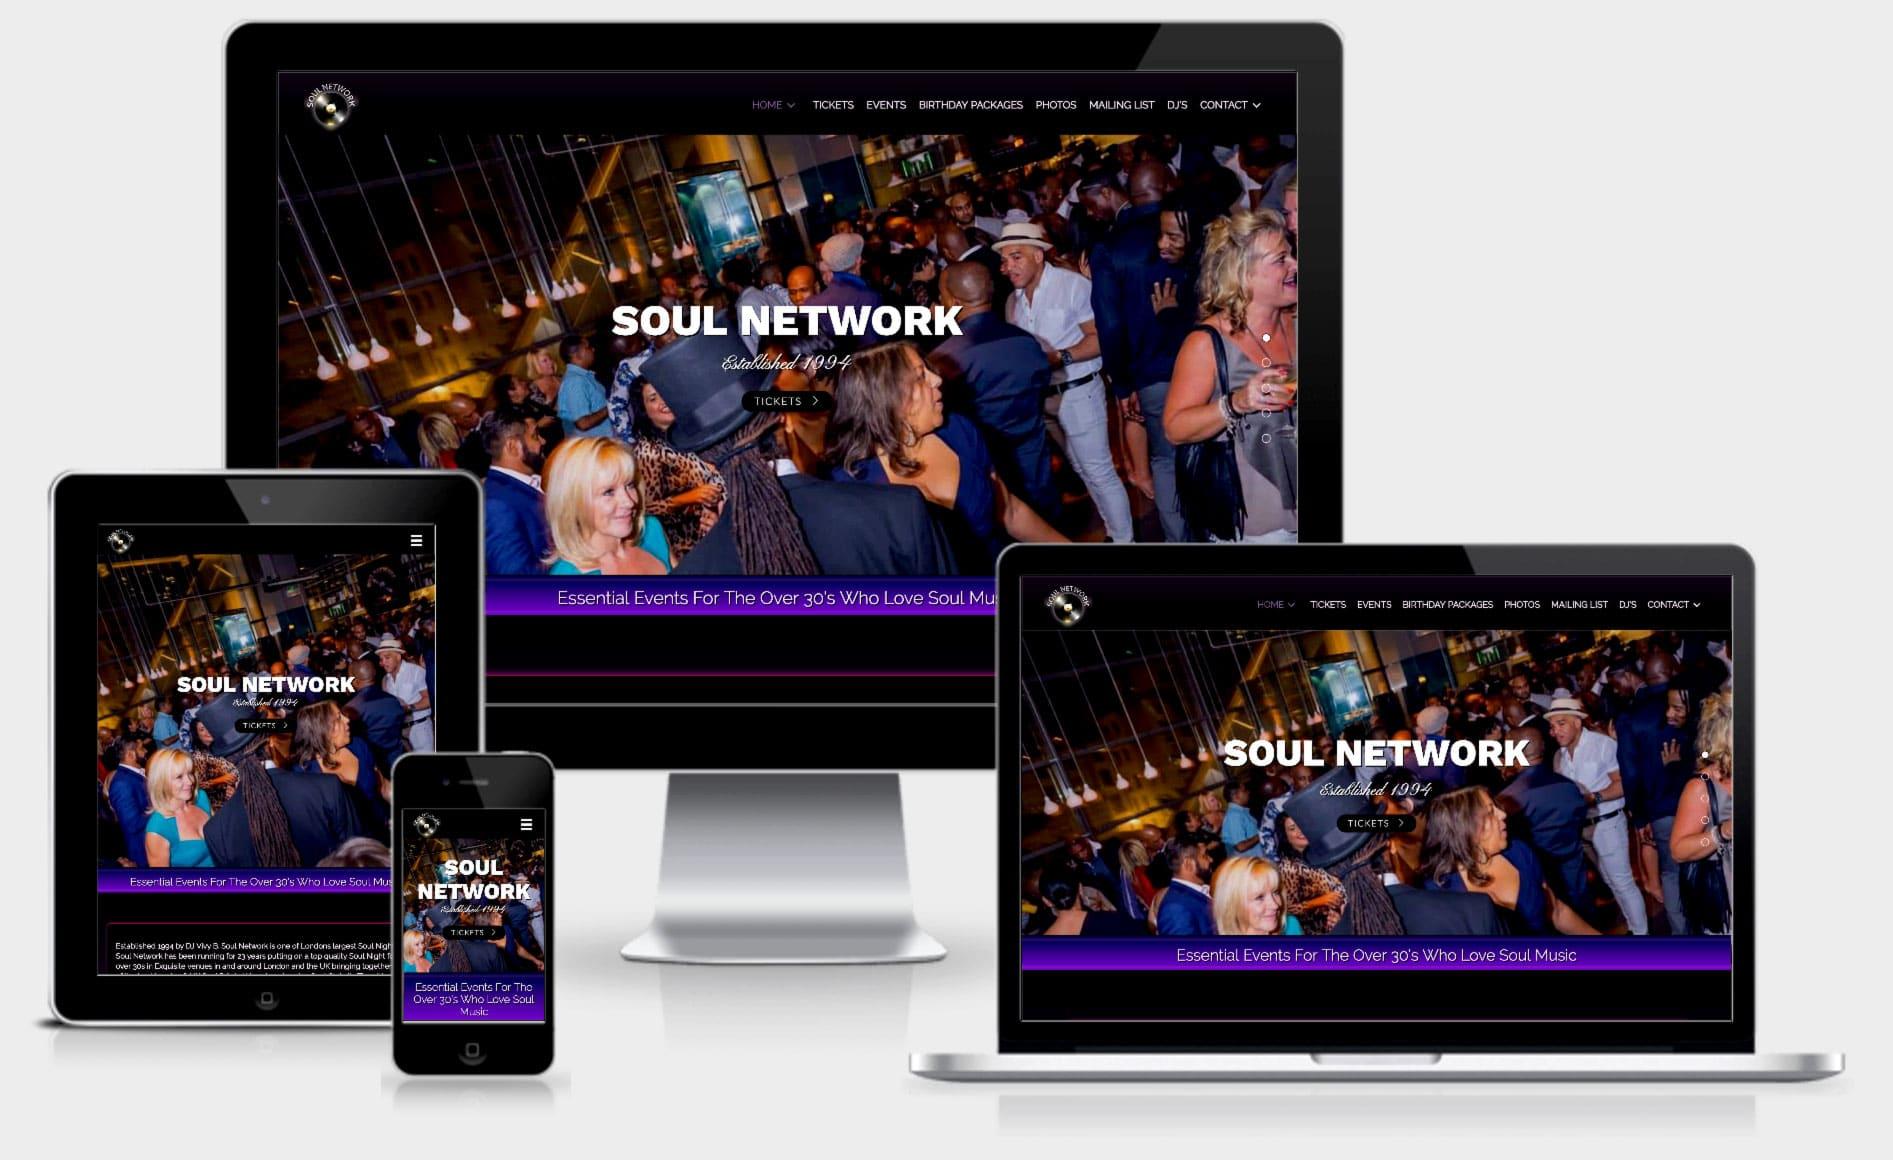 Soul-network-mpower-webdesign-template